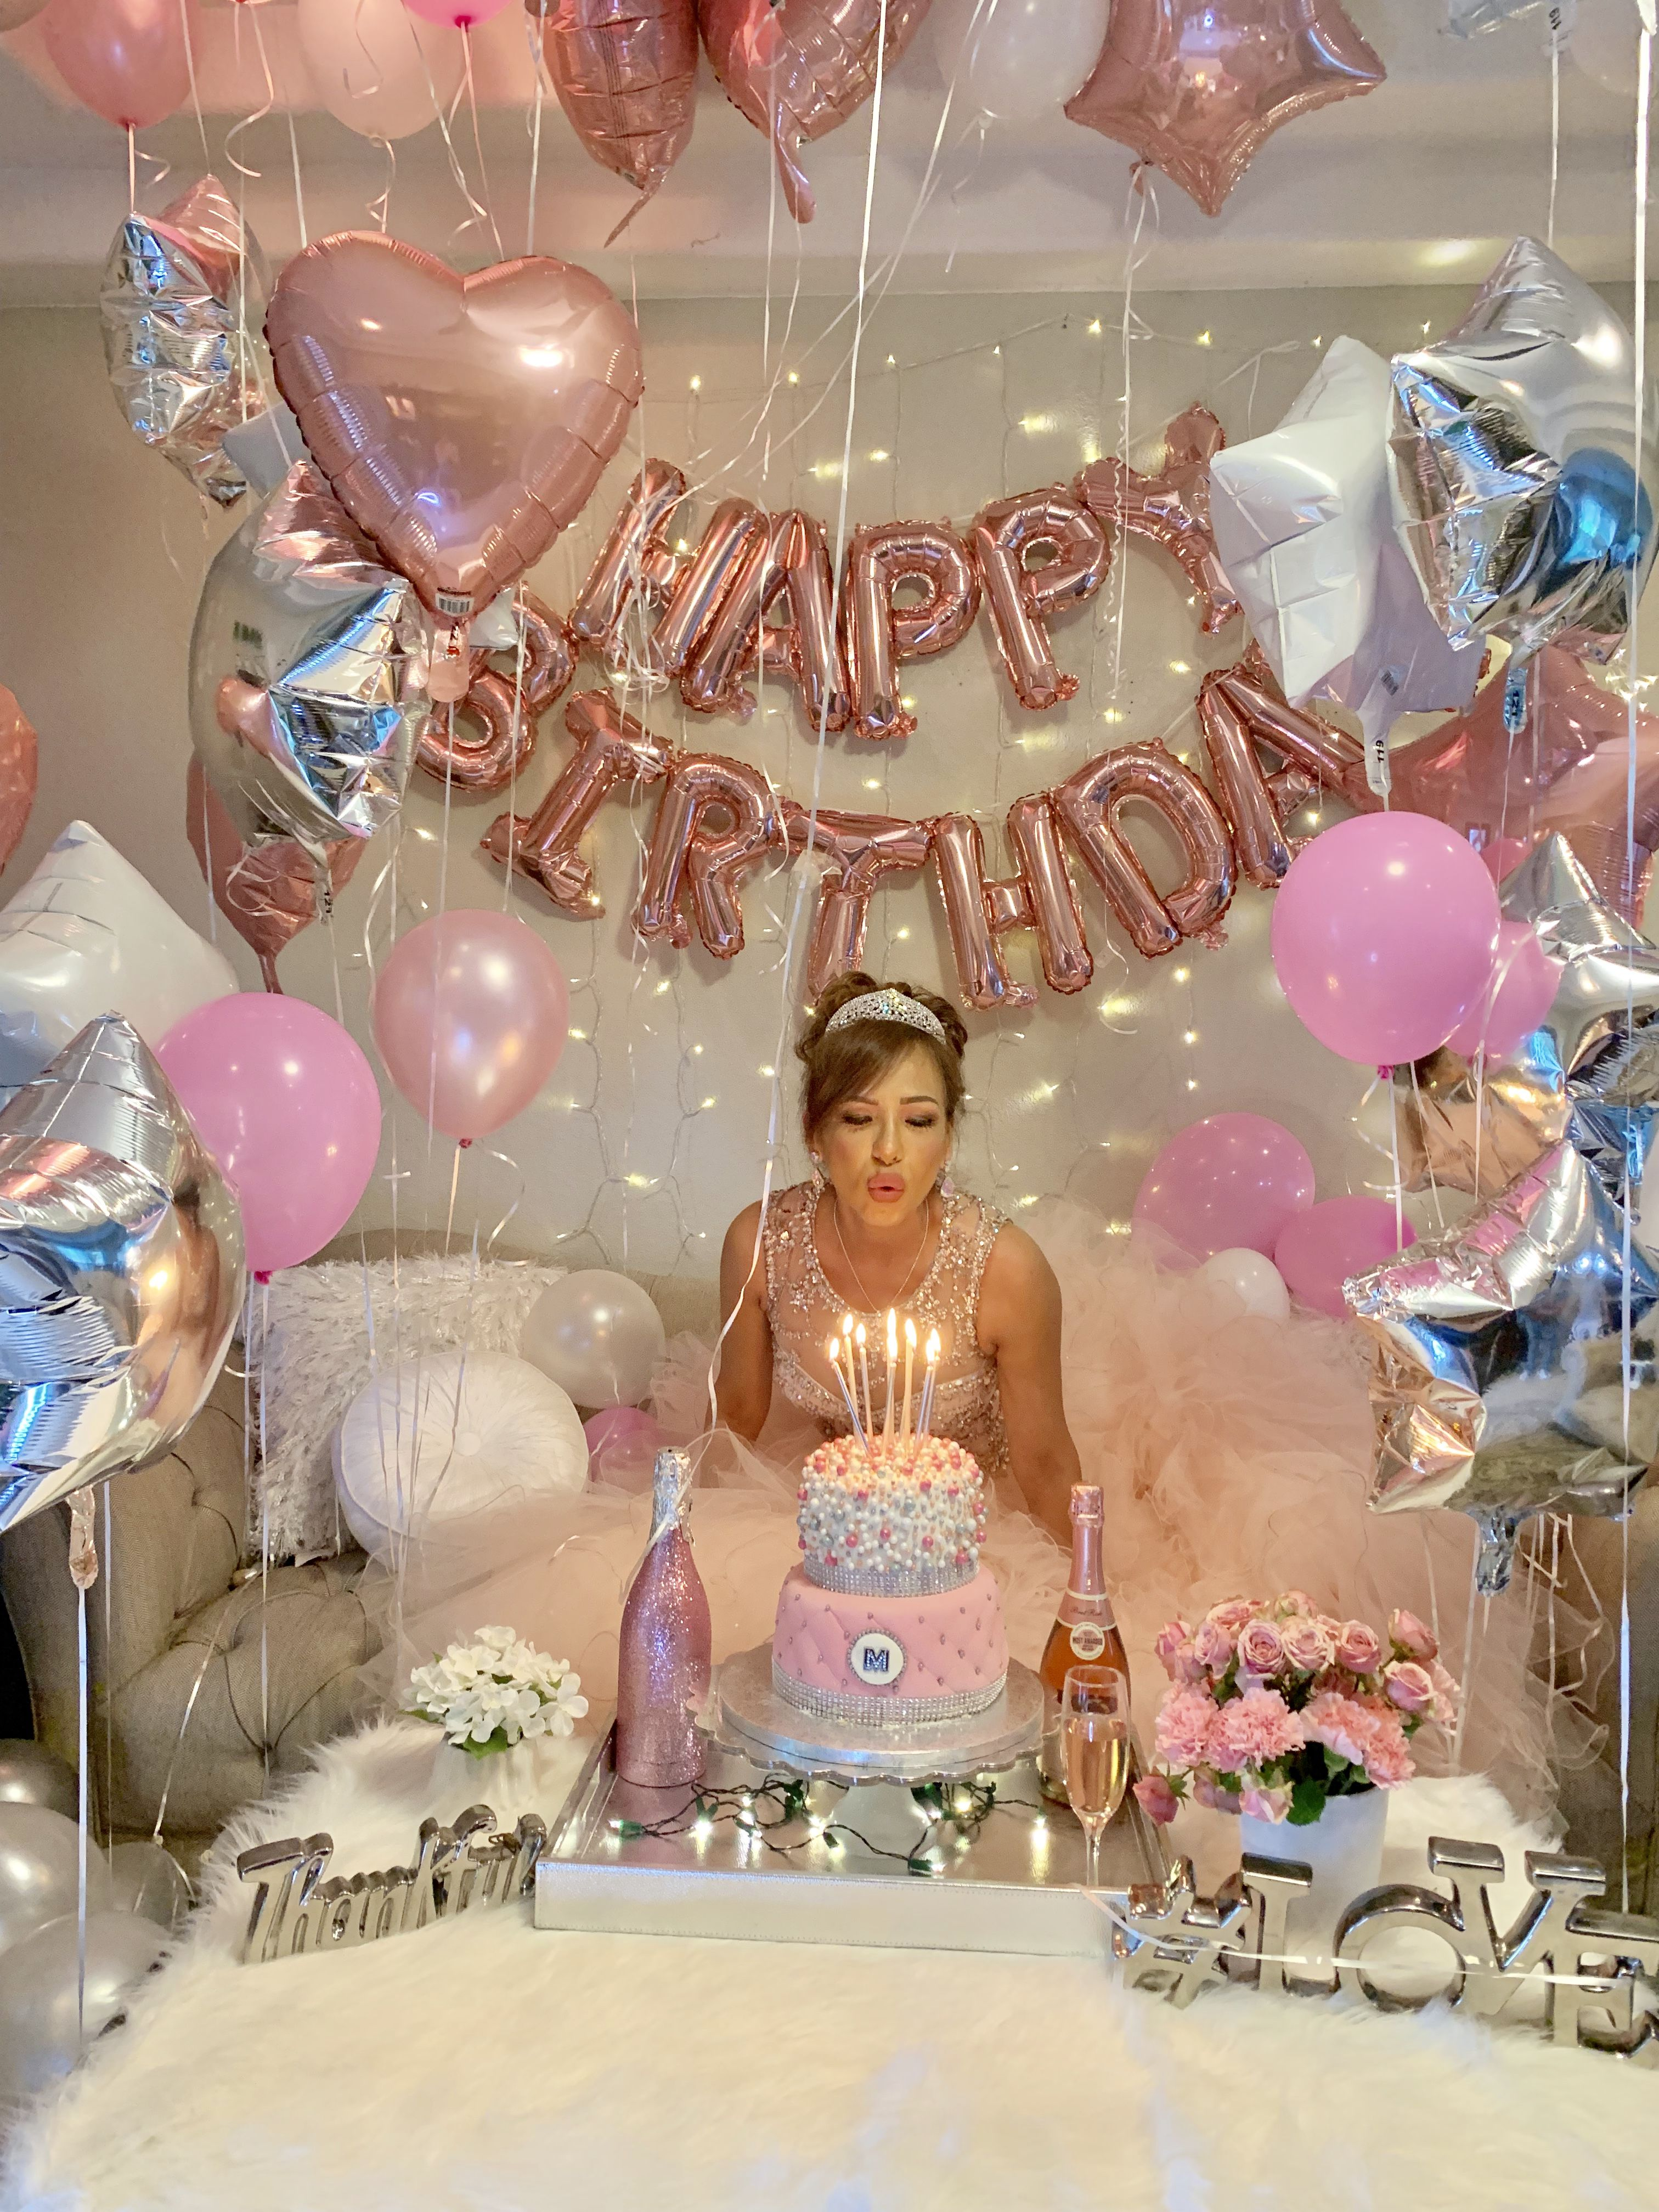 My Quinceañera Birthday pictures, Quinceanera, Rose